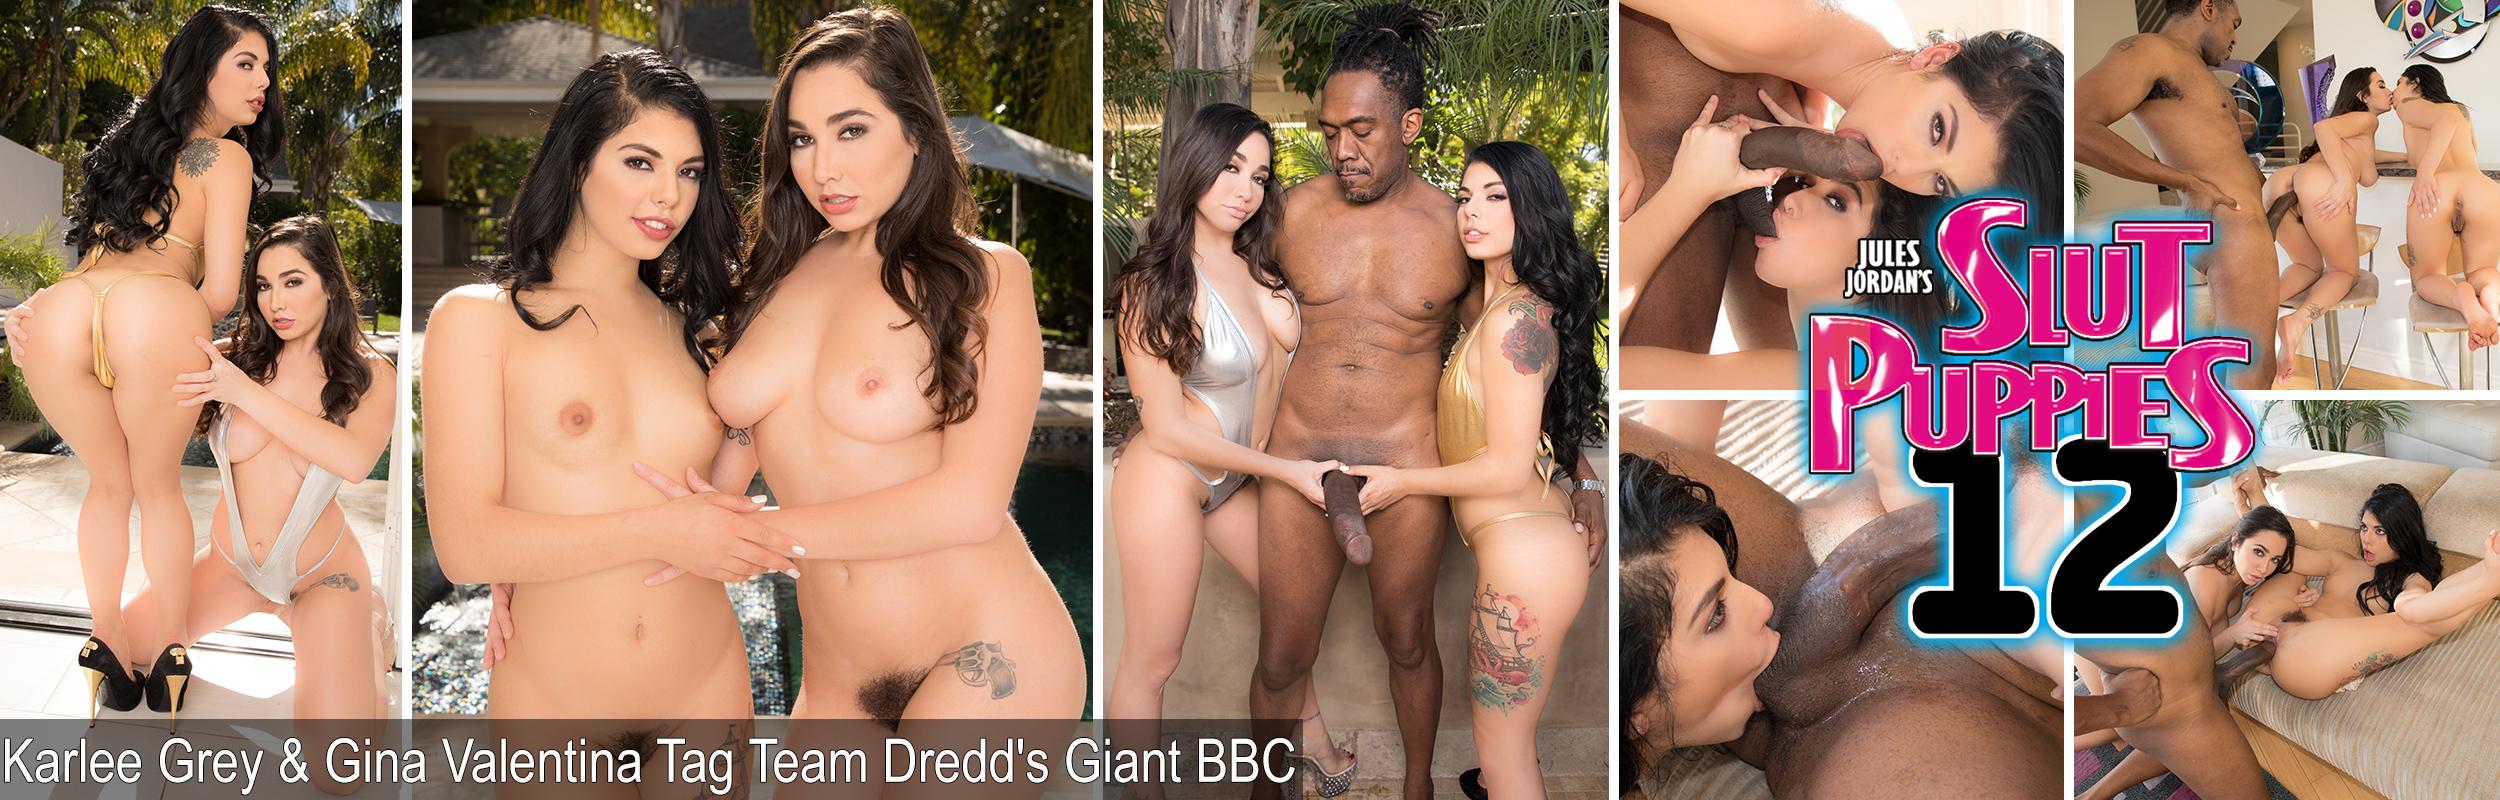 Karlee Grey & Gina Valentina Tag Team Dredd's Giant BBC